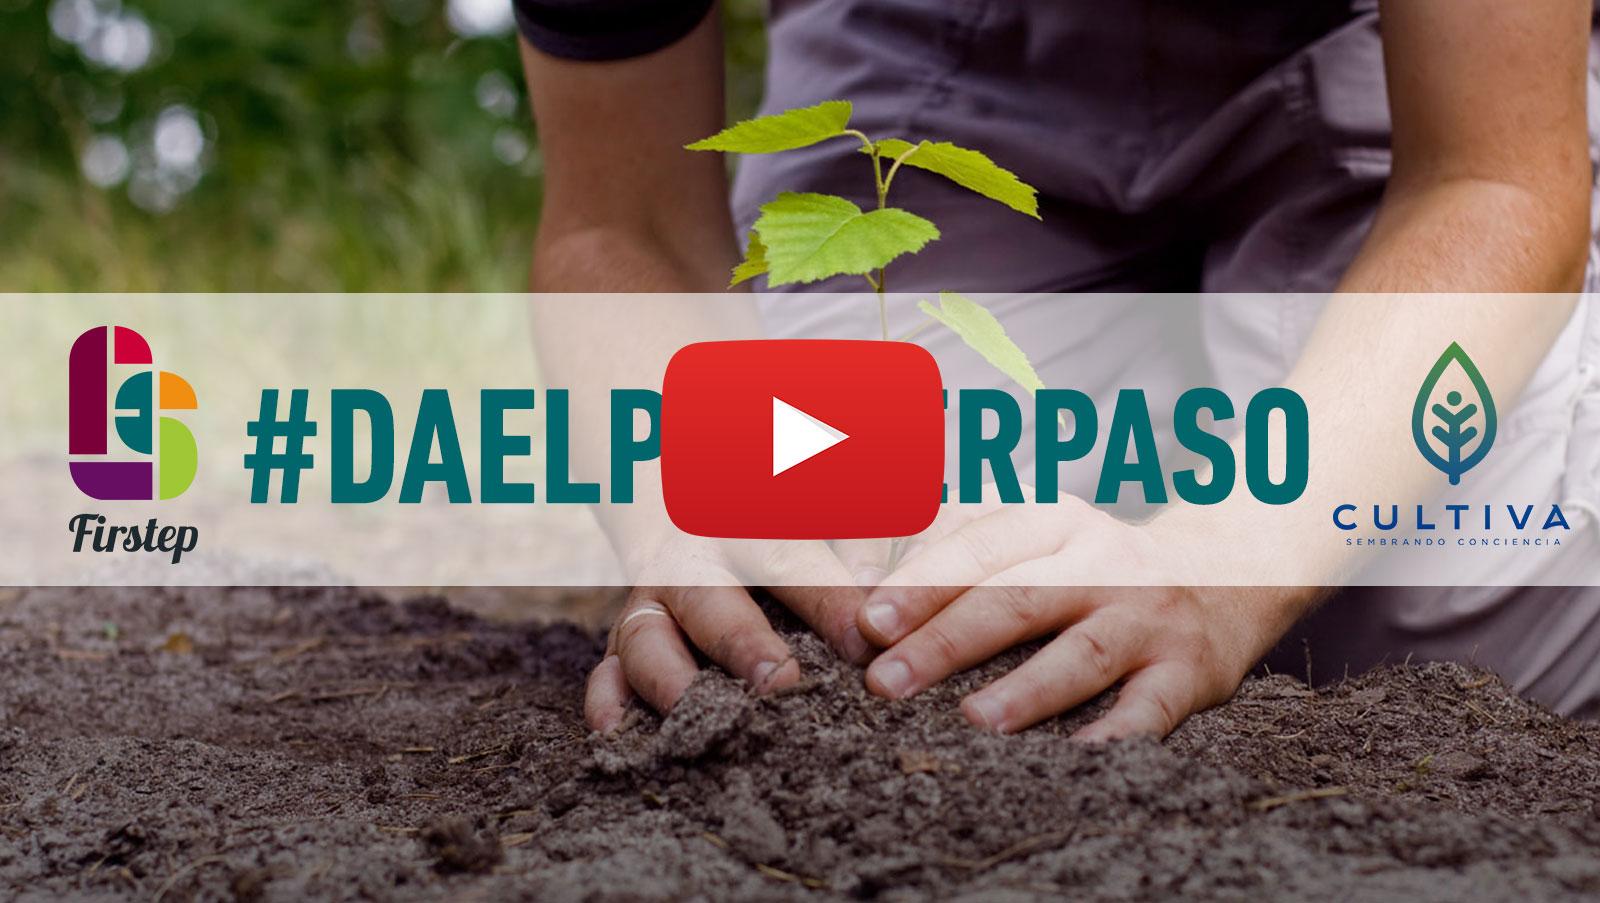 Corporación Cultiva - Reforestemos Chile Nativo